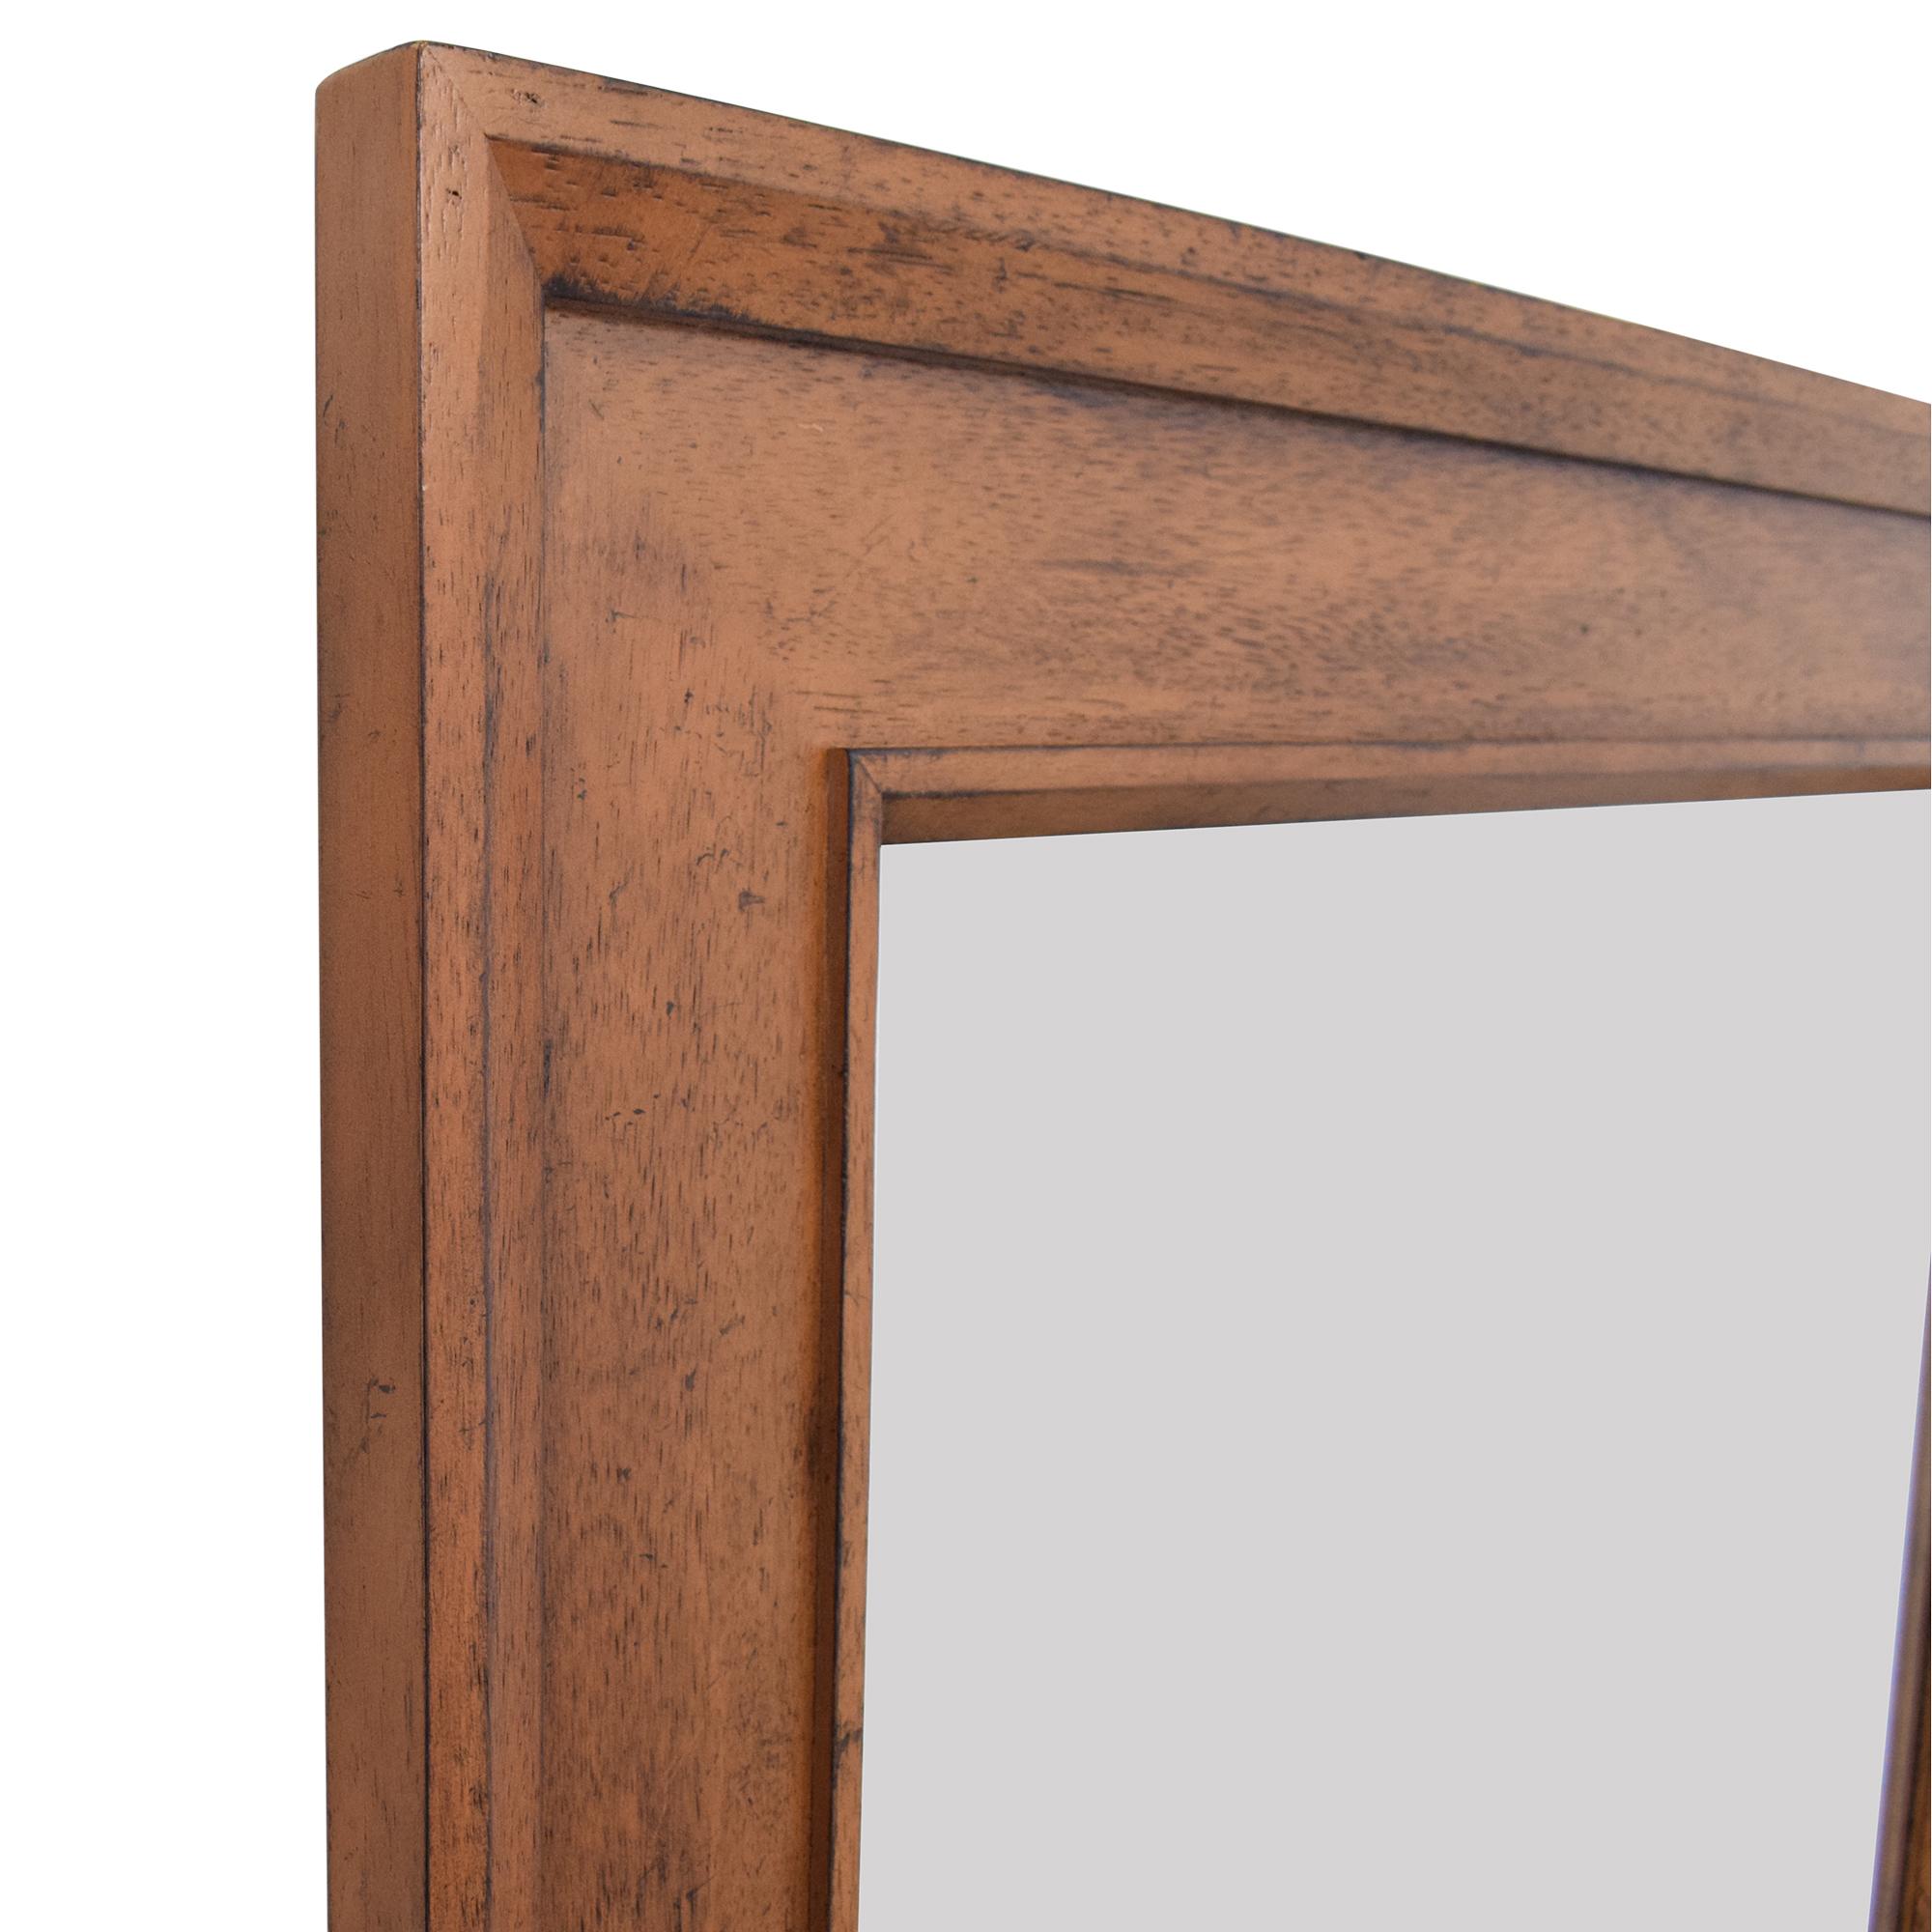 Ethan Allen Bevan Mirror / Decor